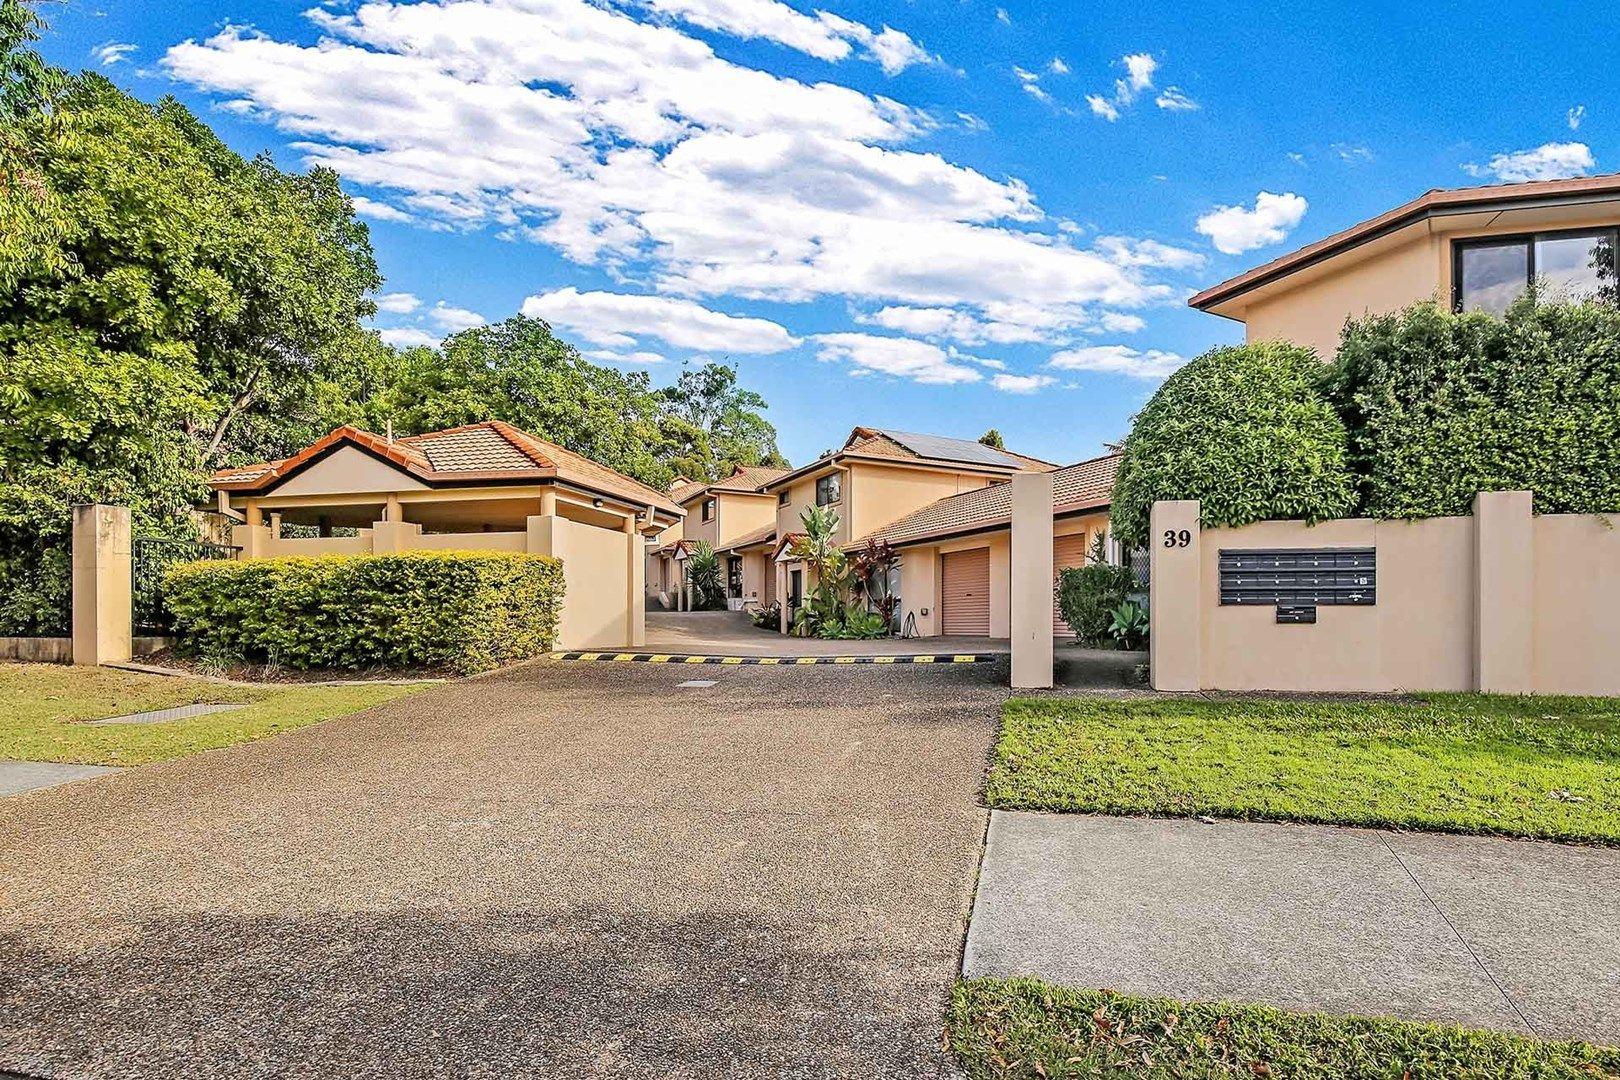 8/39 Pine Valley Drive, Robina QLD 4226, Image 0